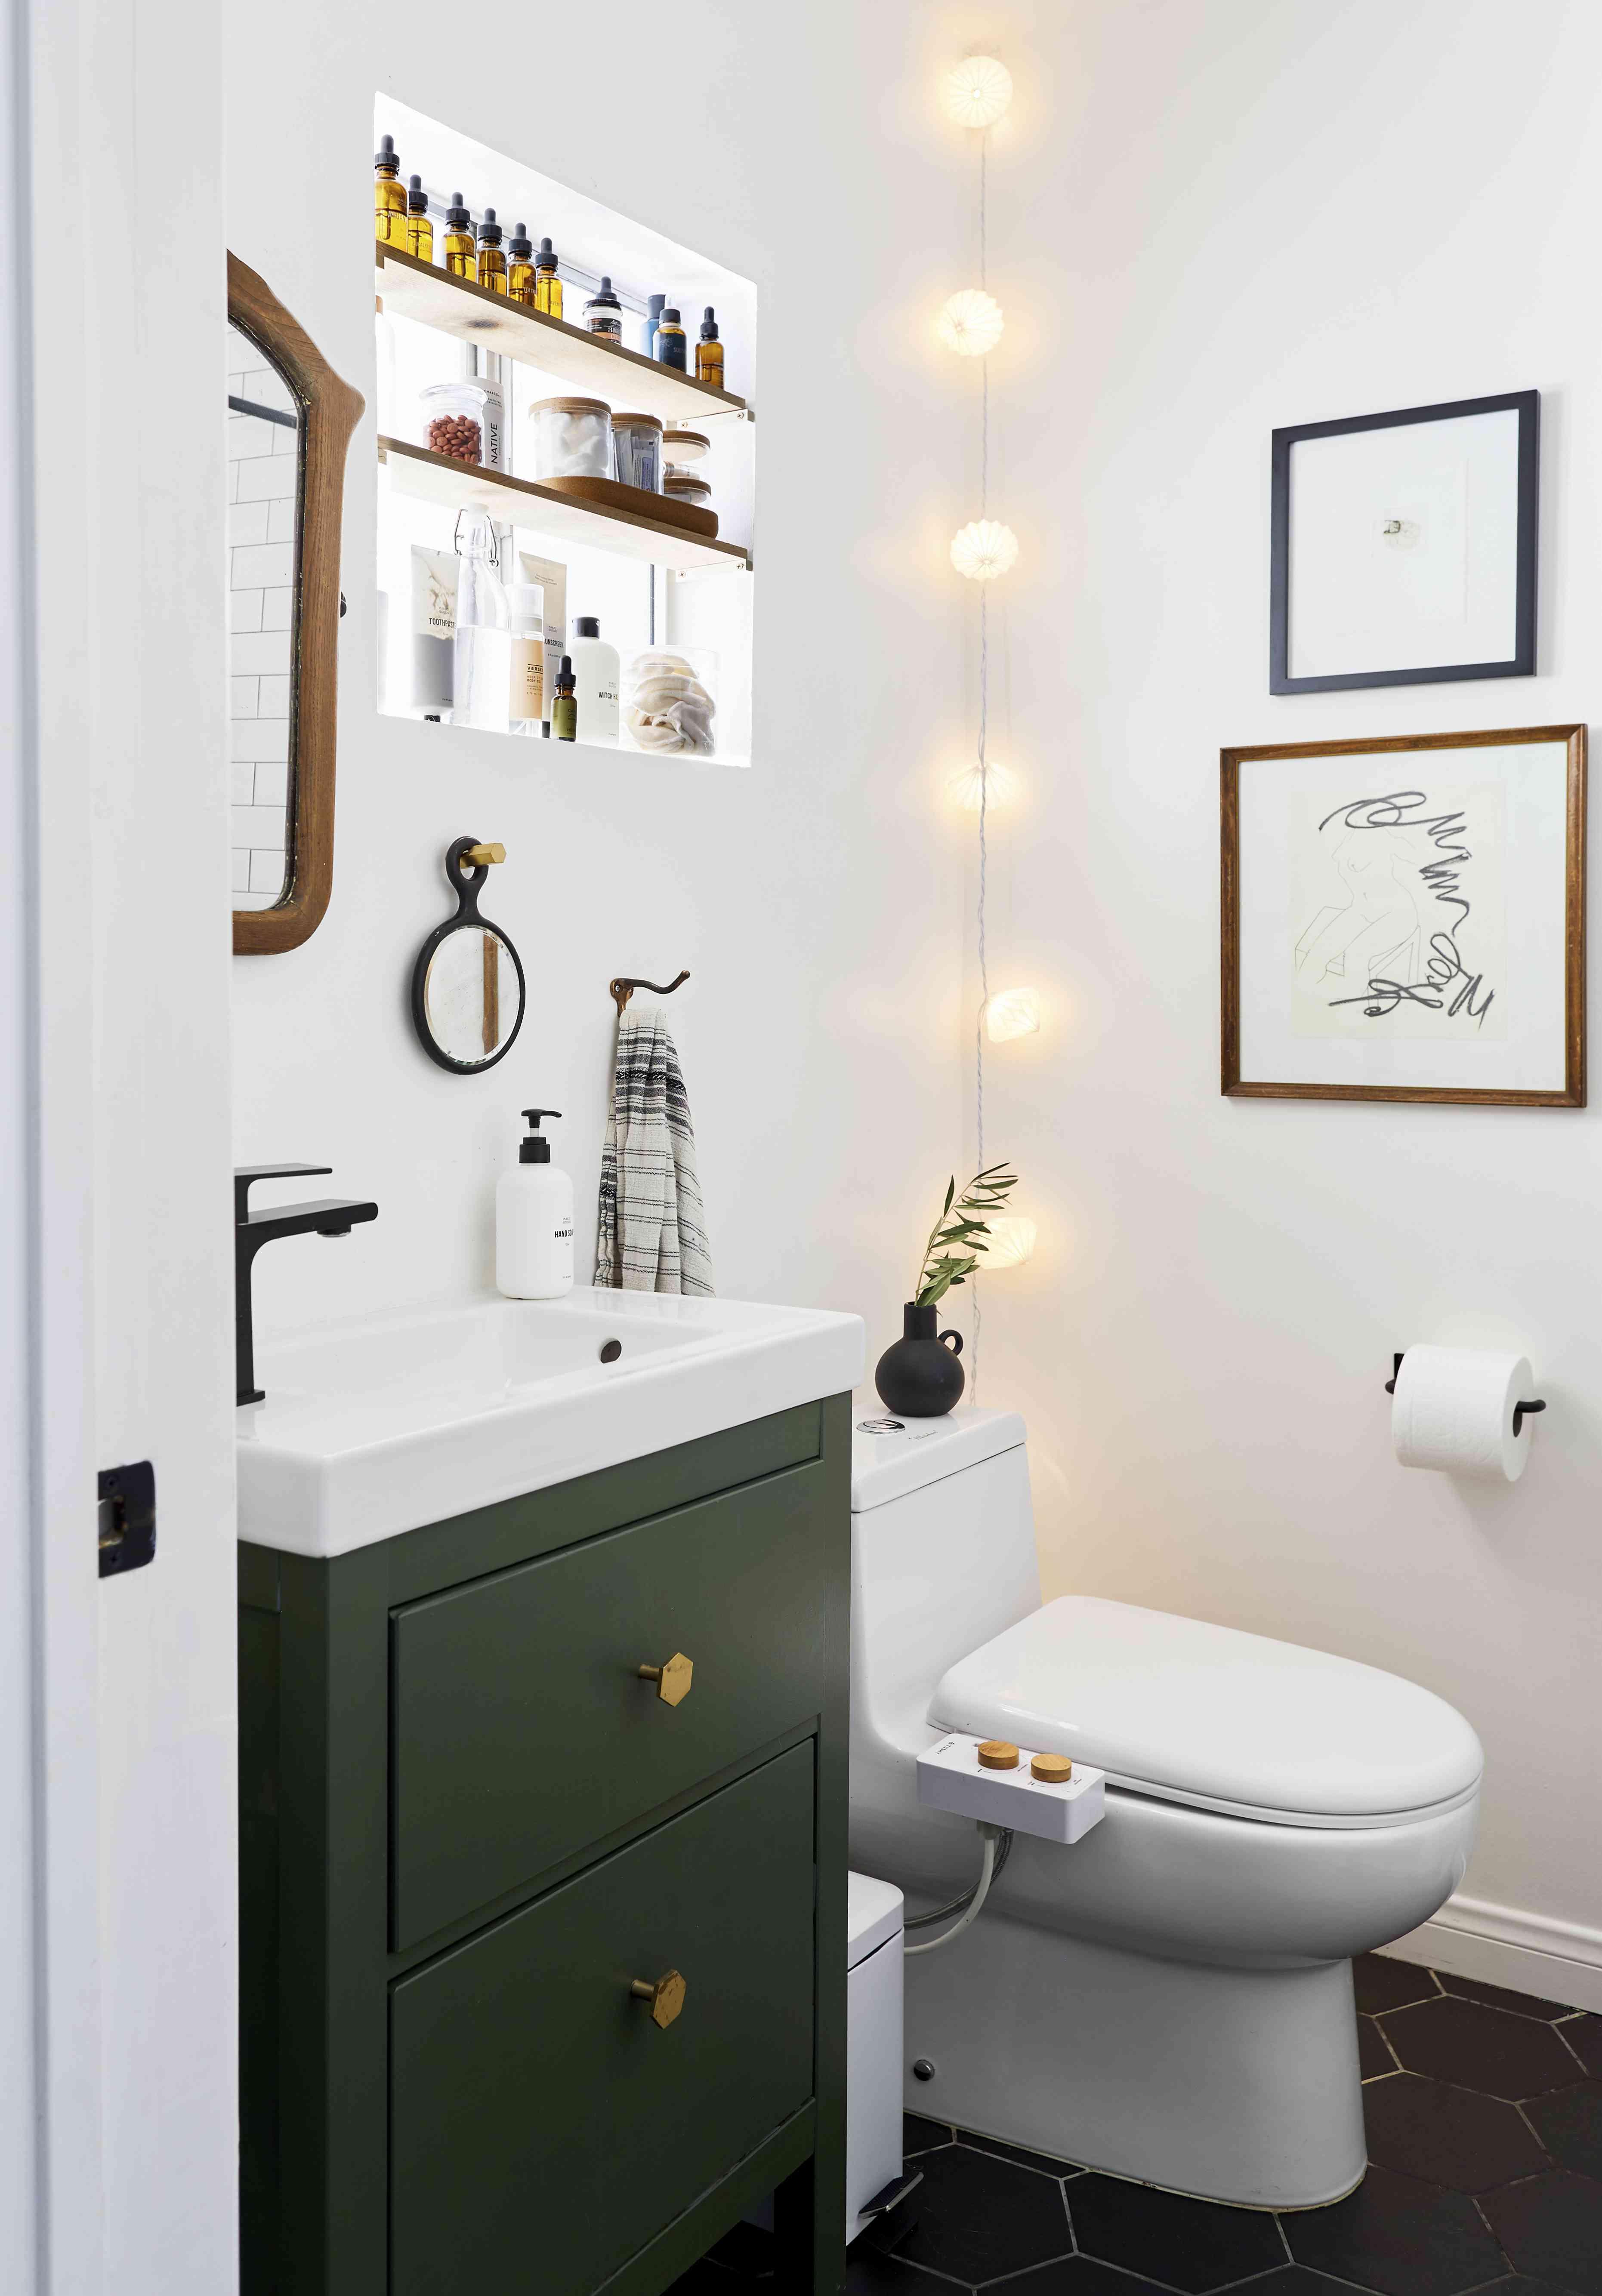 Bathroom with green vanity